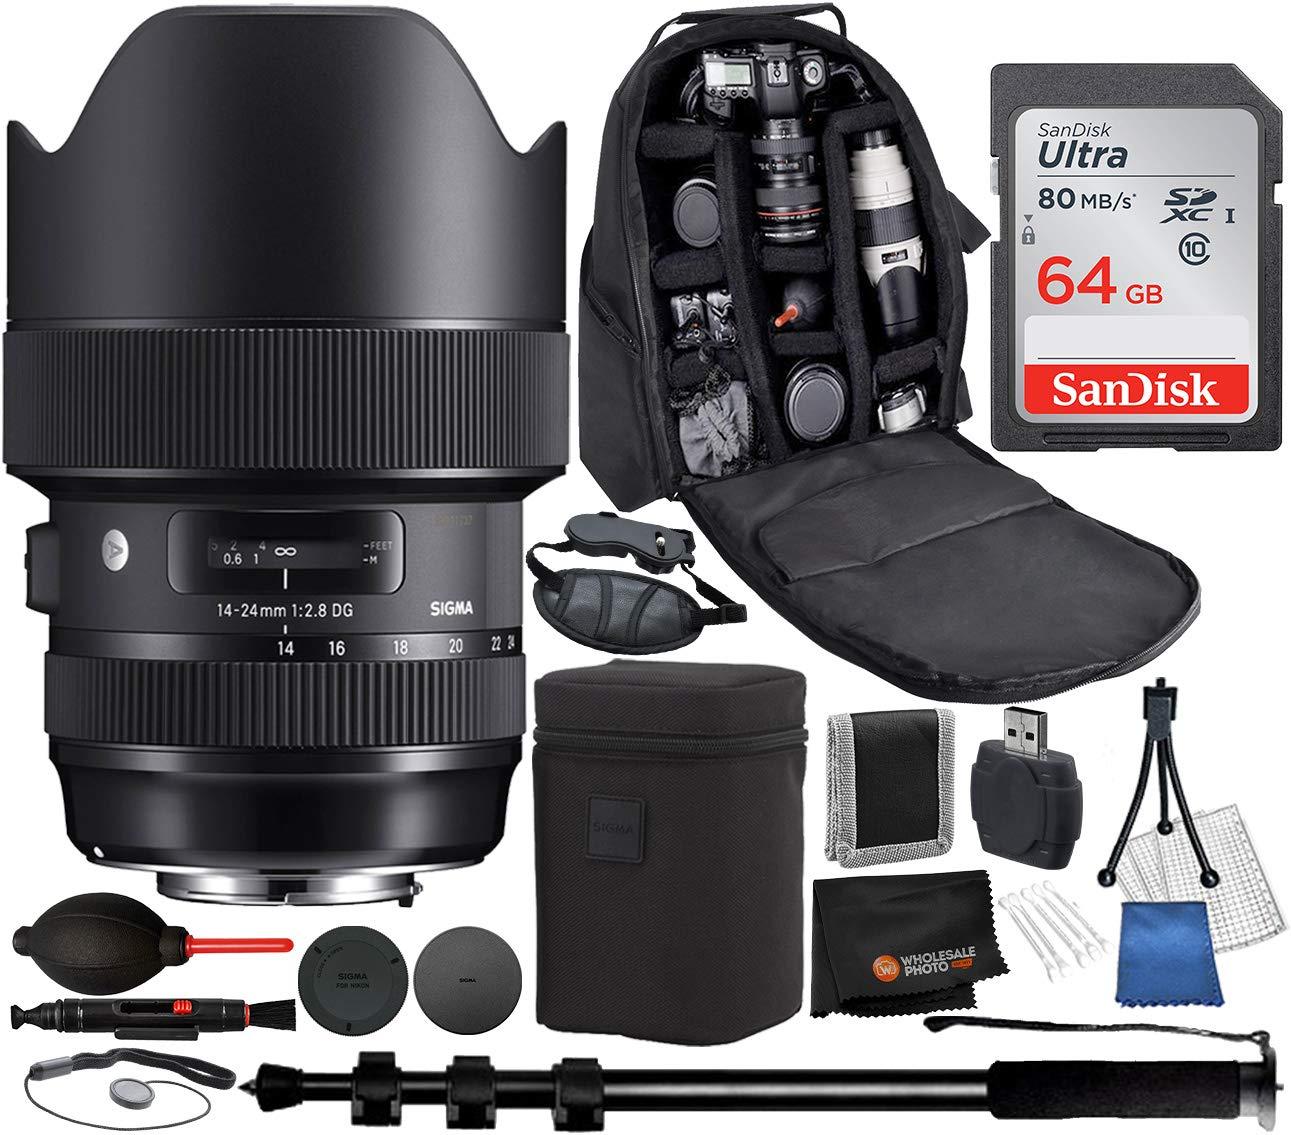 Sigma 14-24mm f/2.8 DG HSM Art Lens for Nikon F – 11PC Accessory Bundle Includes: Backpack - Pro Monopod - 64GB Memory Card + More